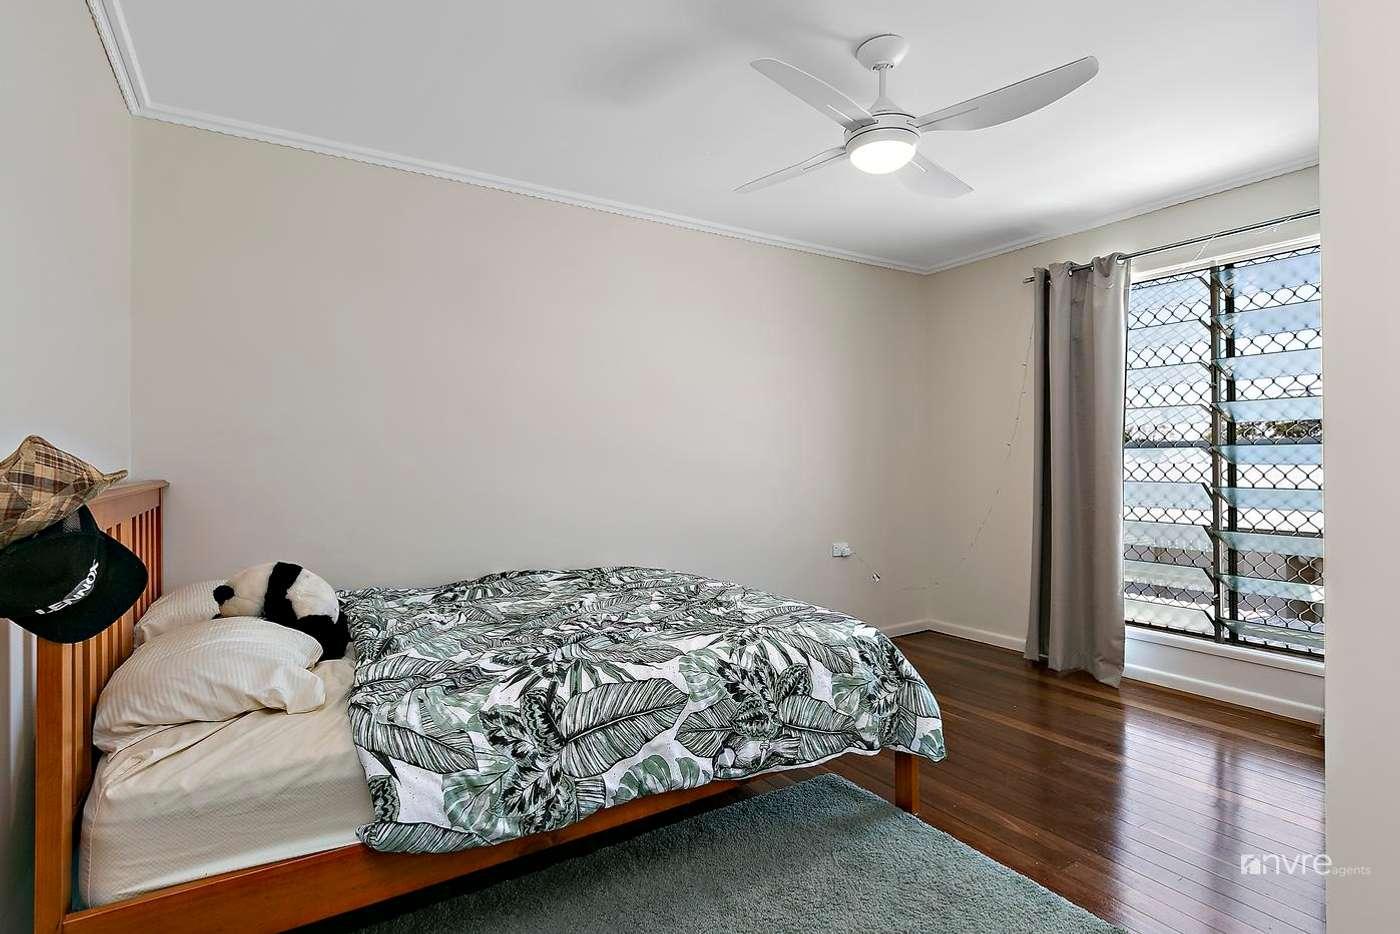 Sixth view of Homely house listing, 24 Kingsford Street, Kippa-ring QLD 4021